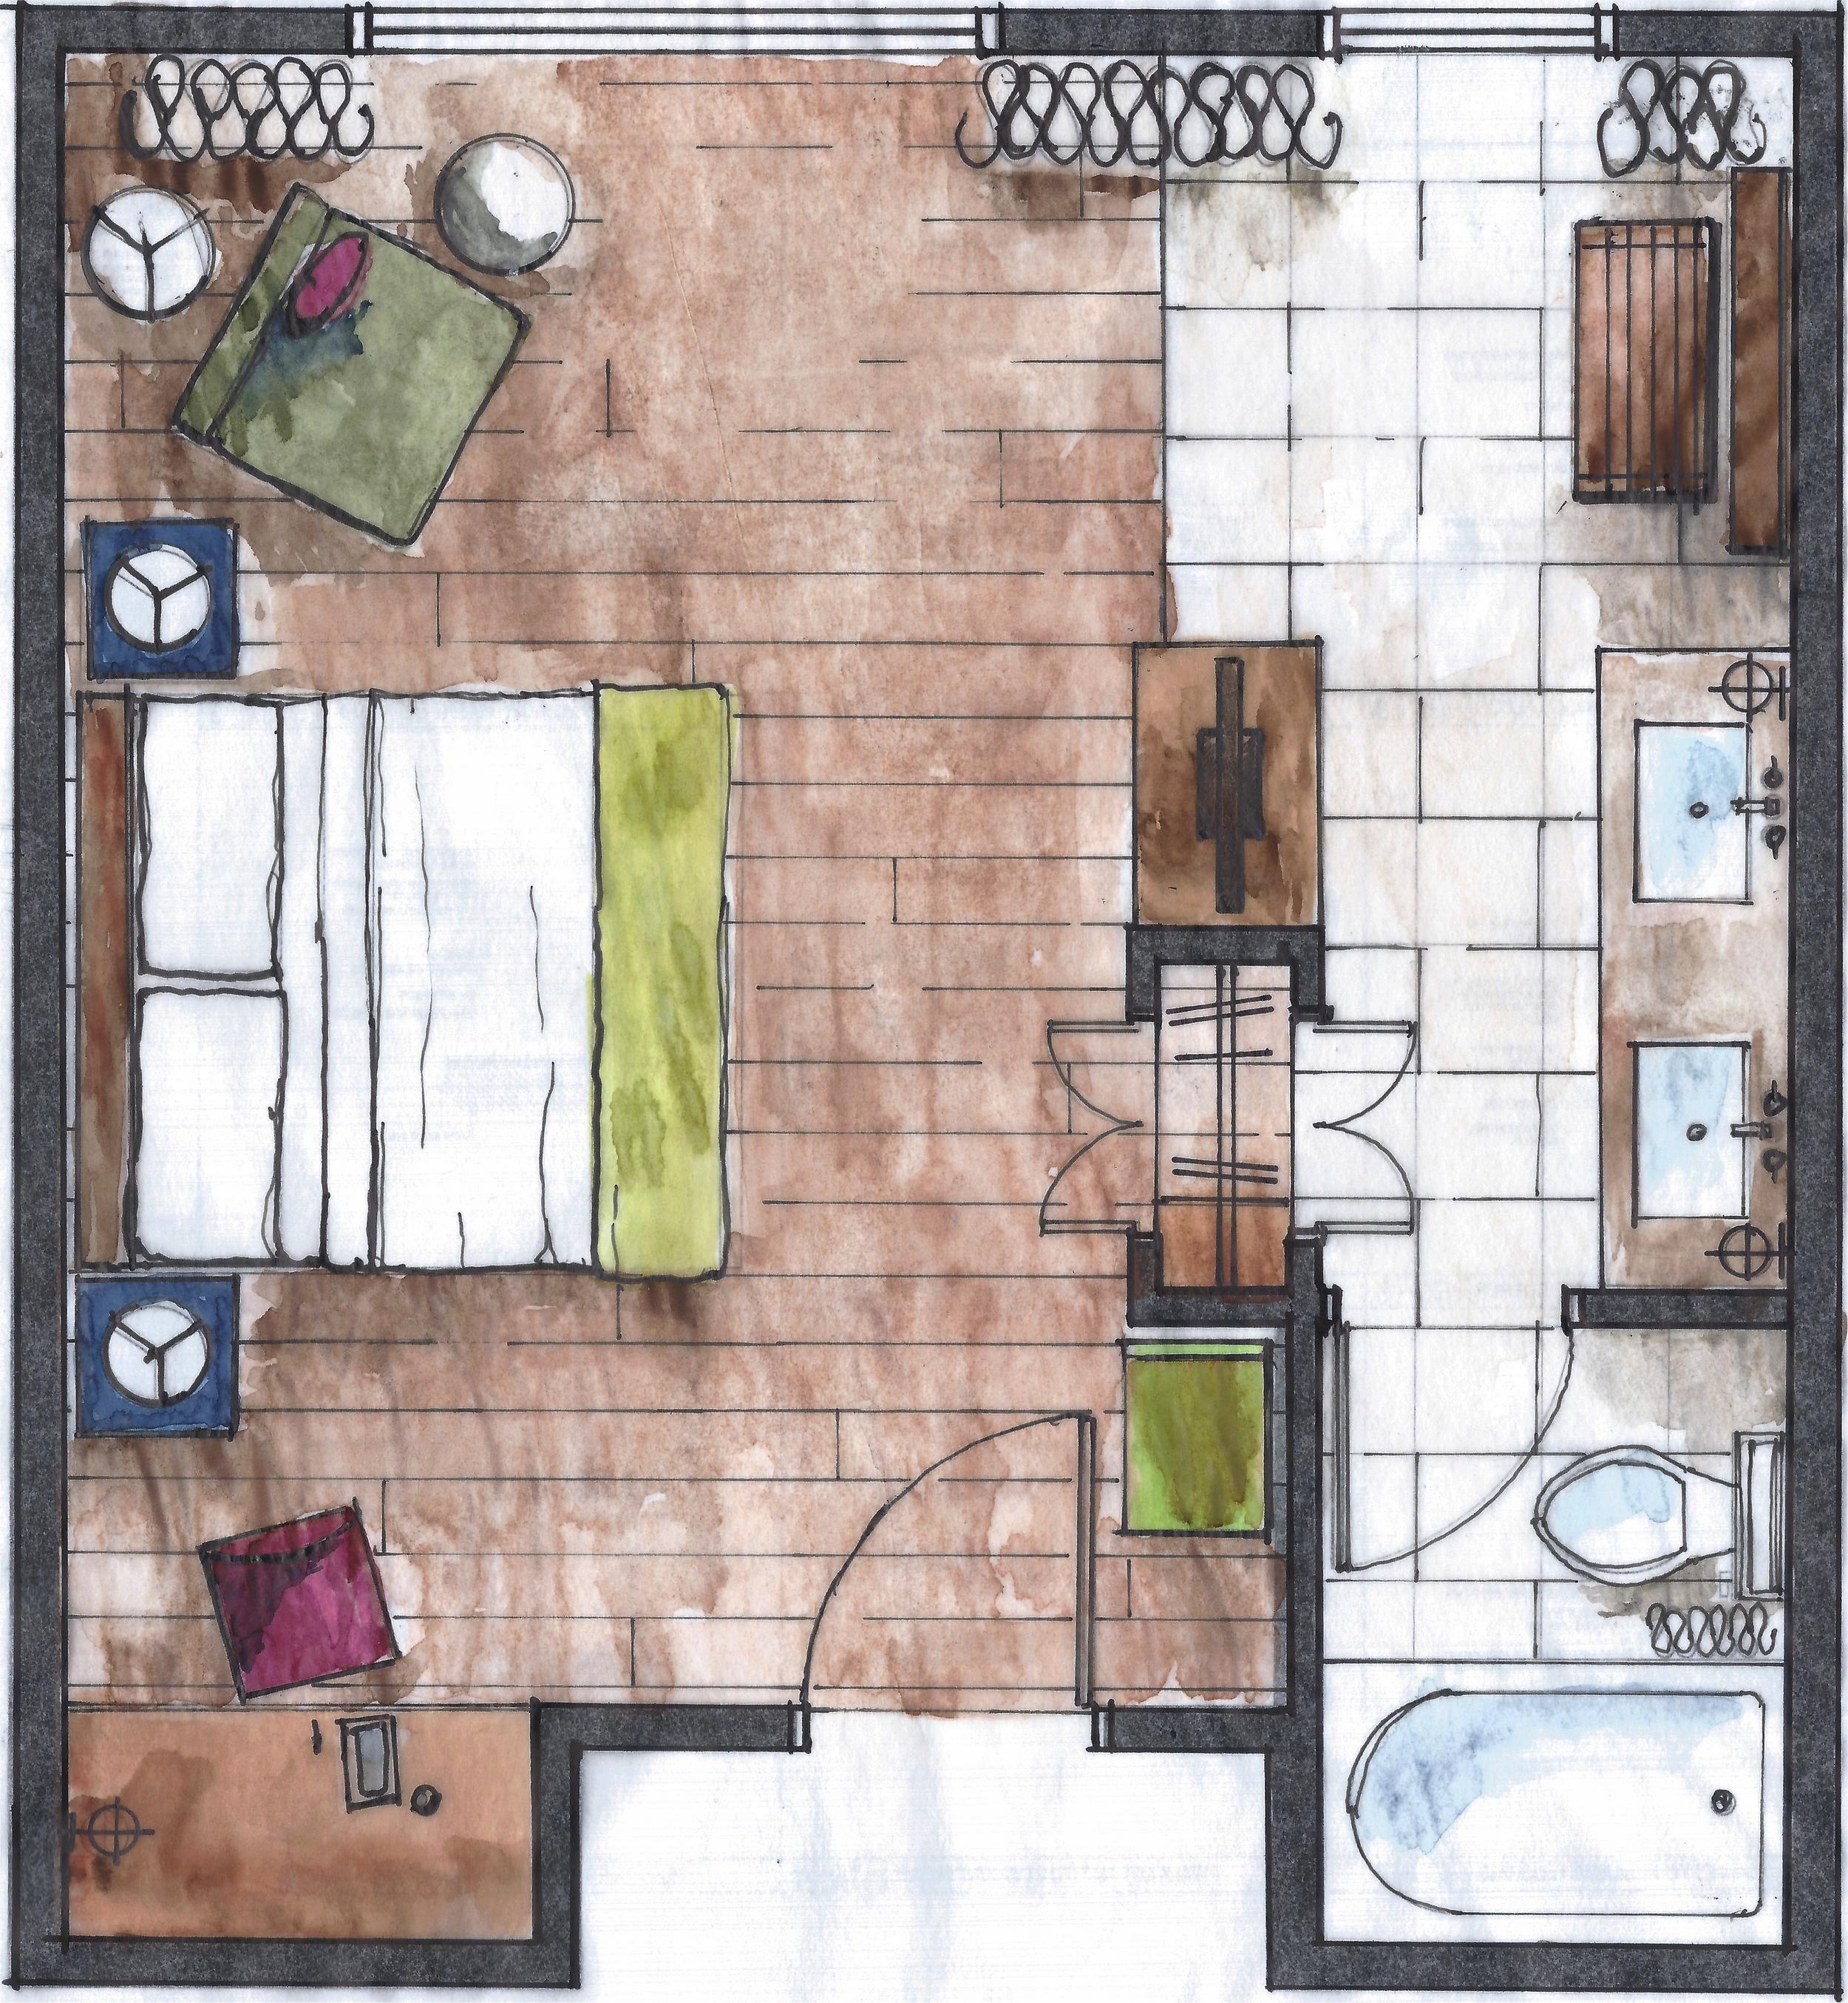 Watertown Hotel, Seattle WA  - King suite floor plan  with Degen & Degen